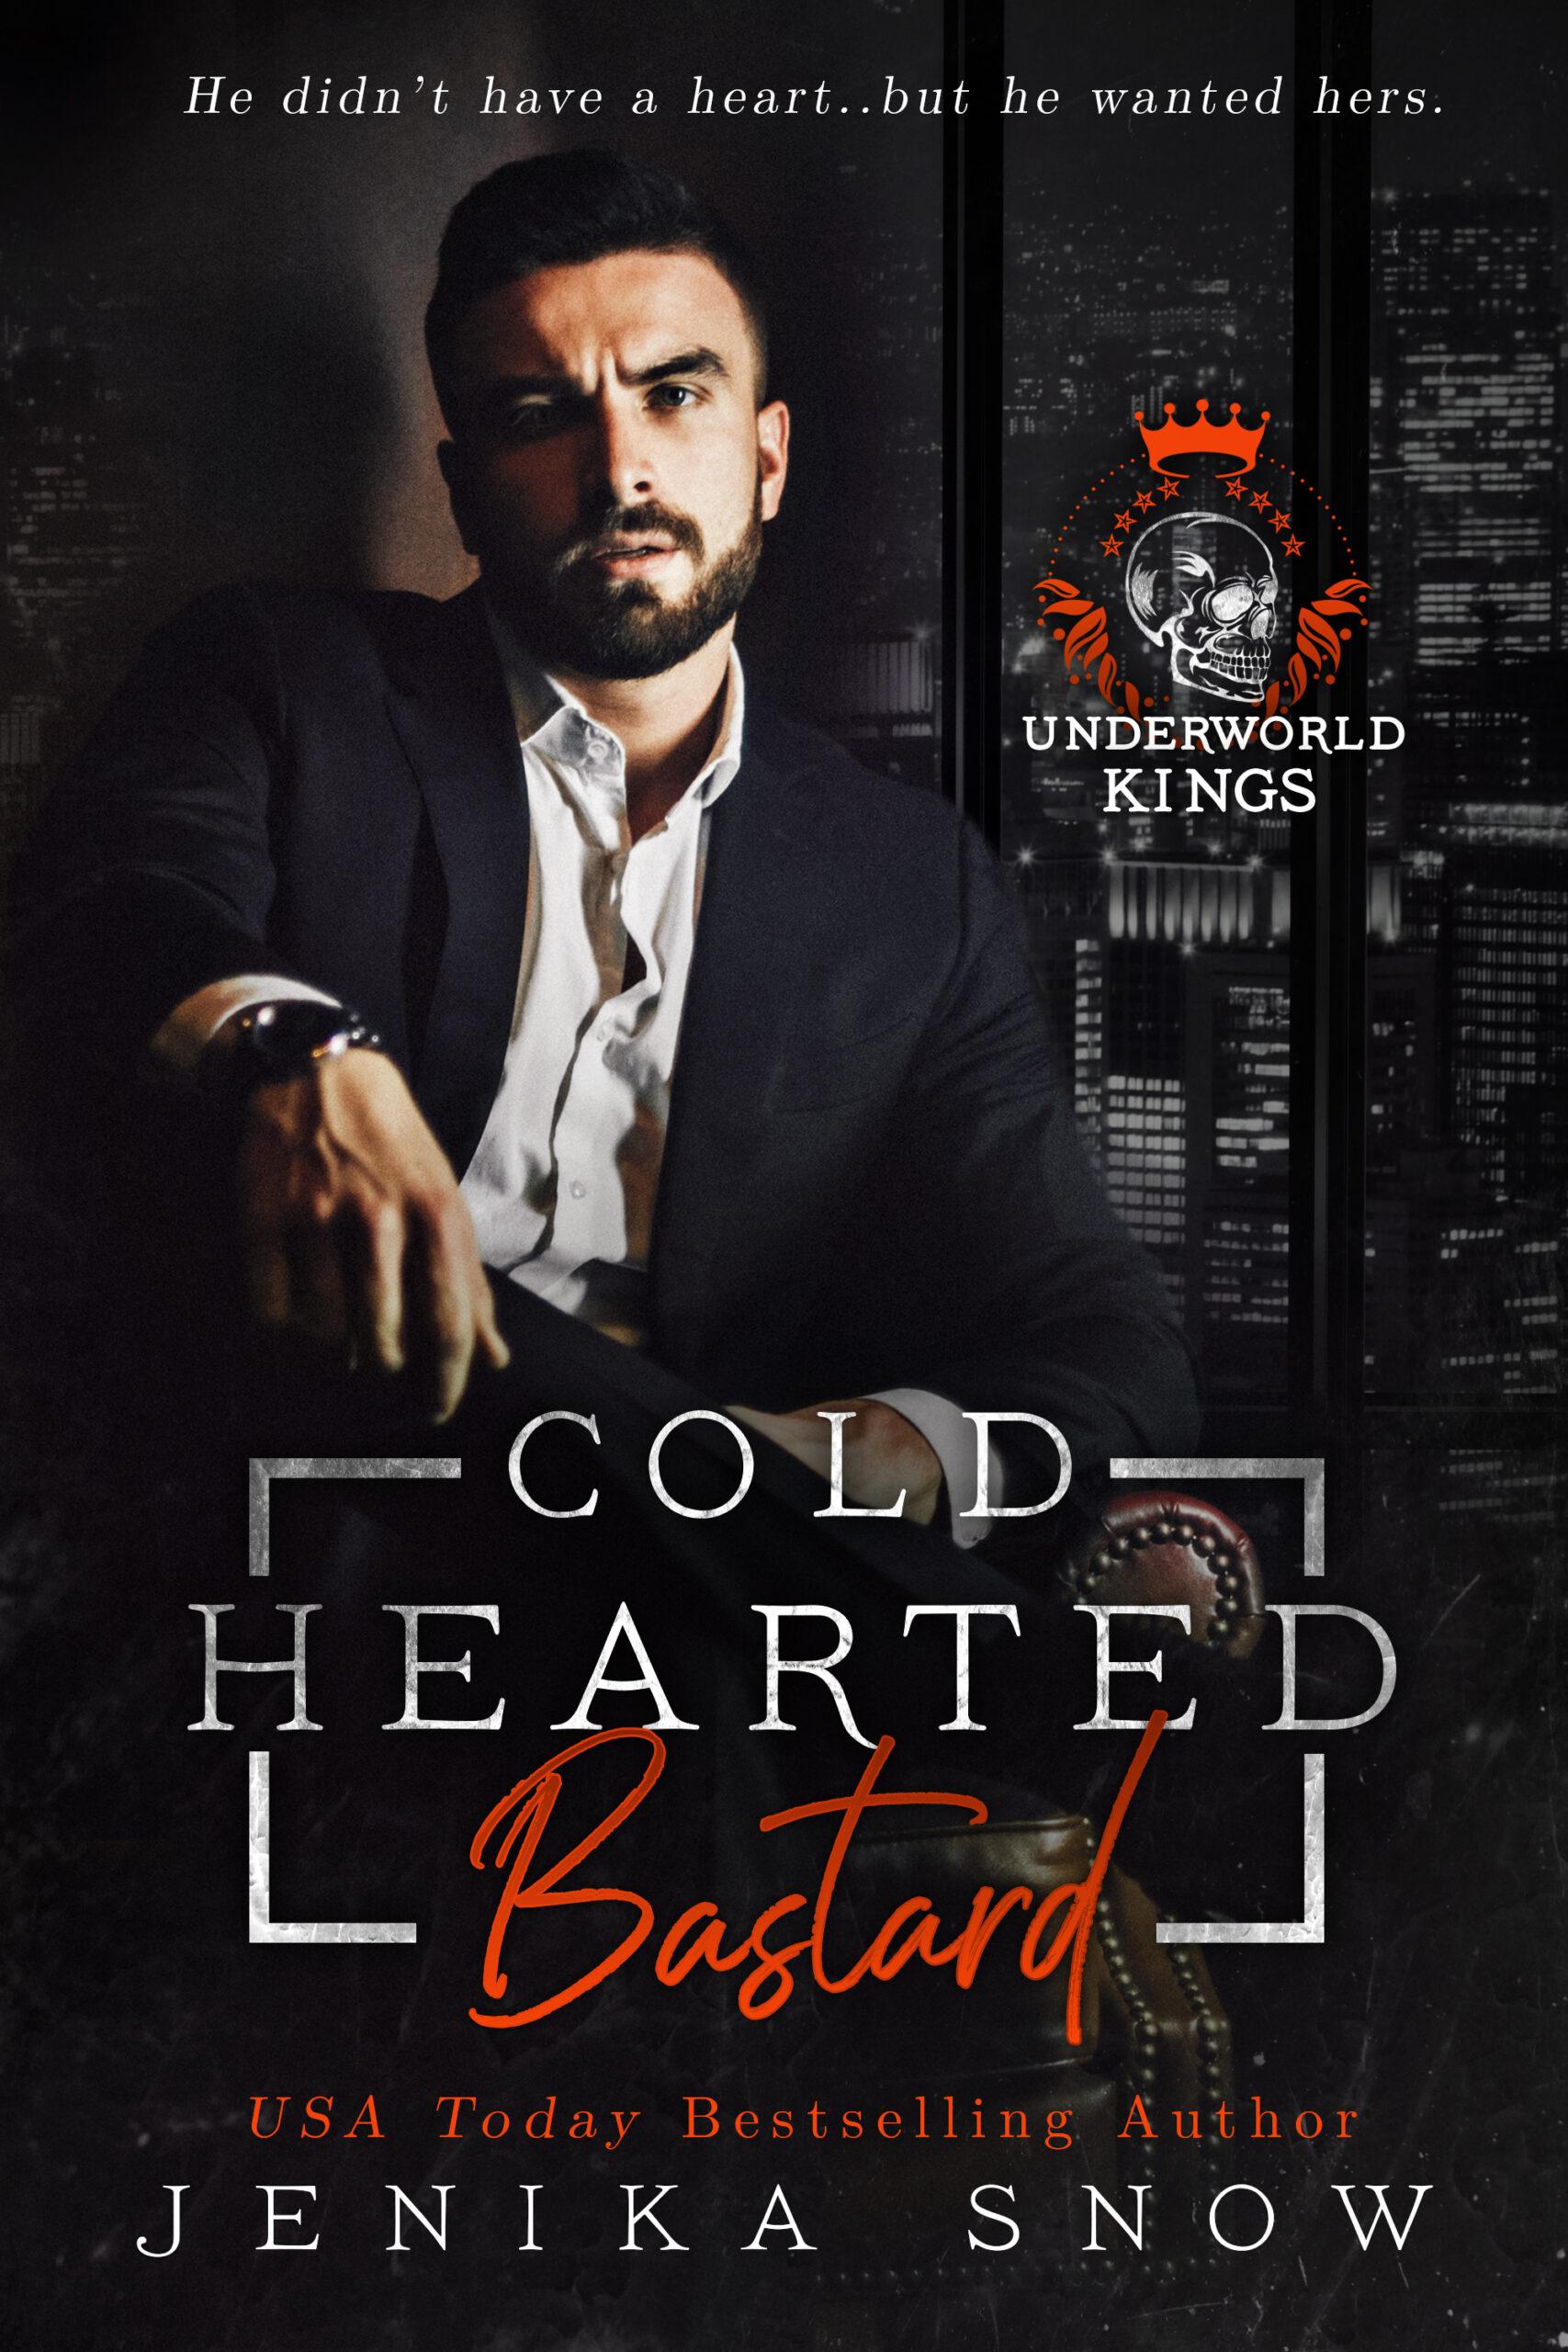 Cold_Hearted_Bastard_Final